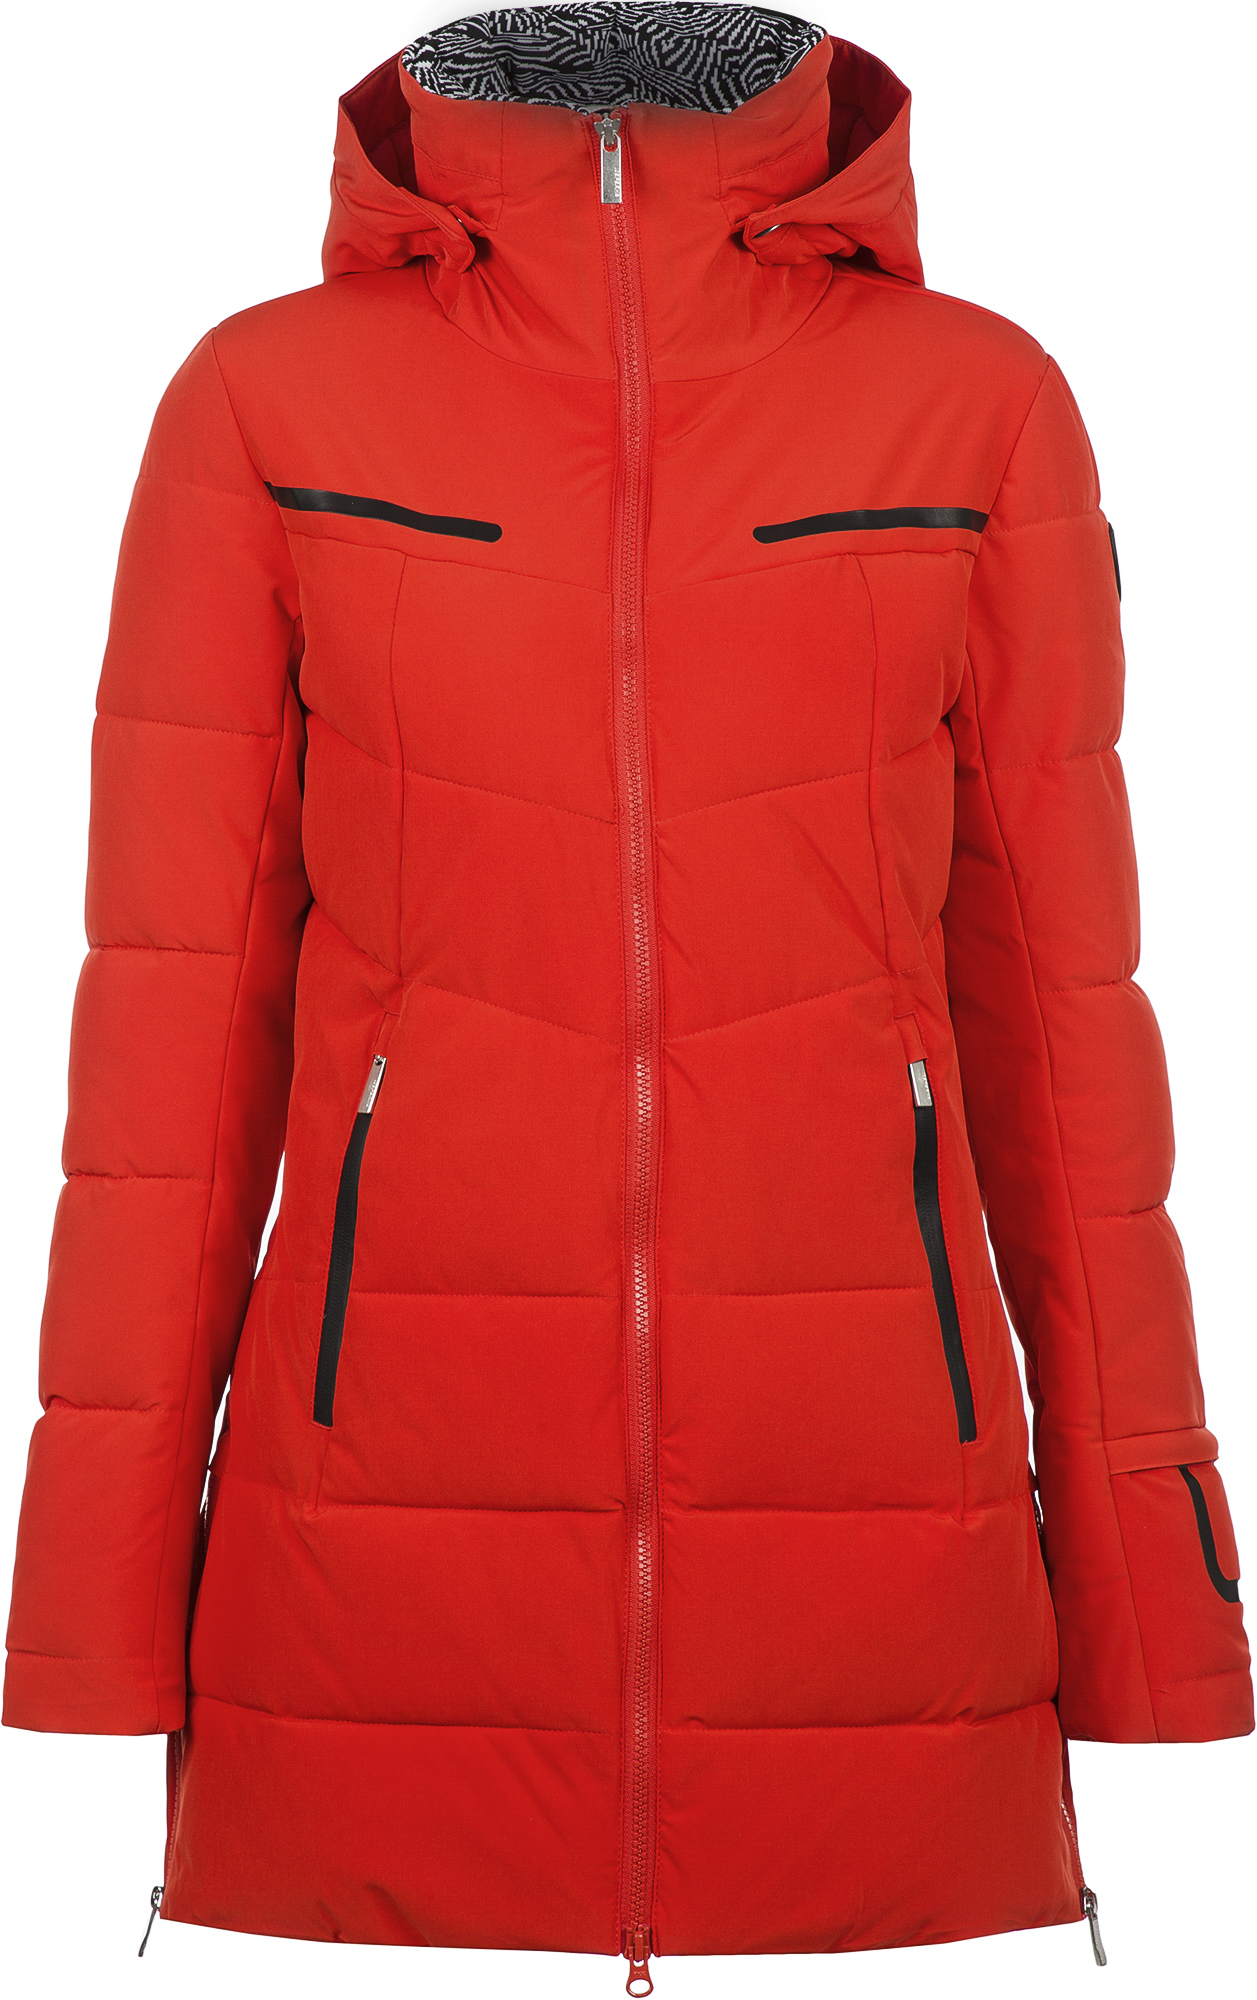 IcePeak Куртка утепленная женская IcePeak Elida, размер 48